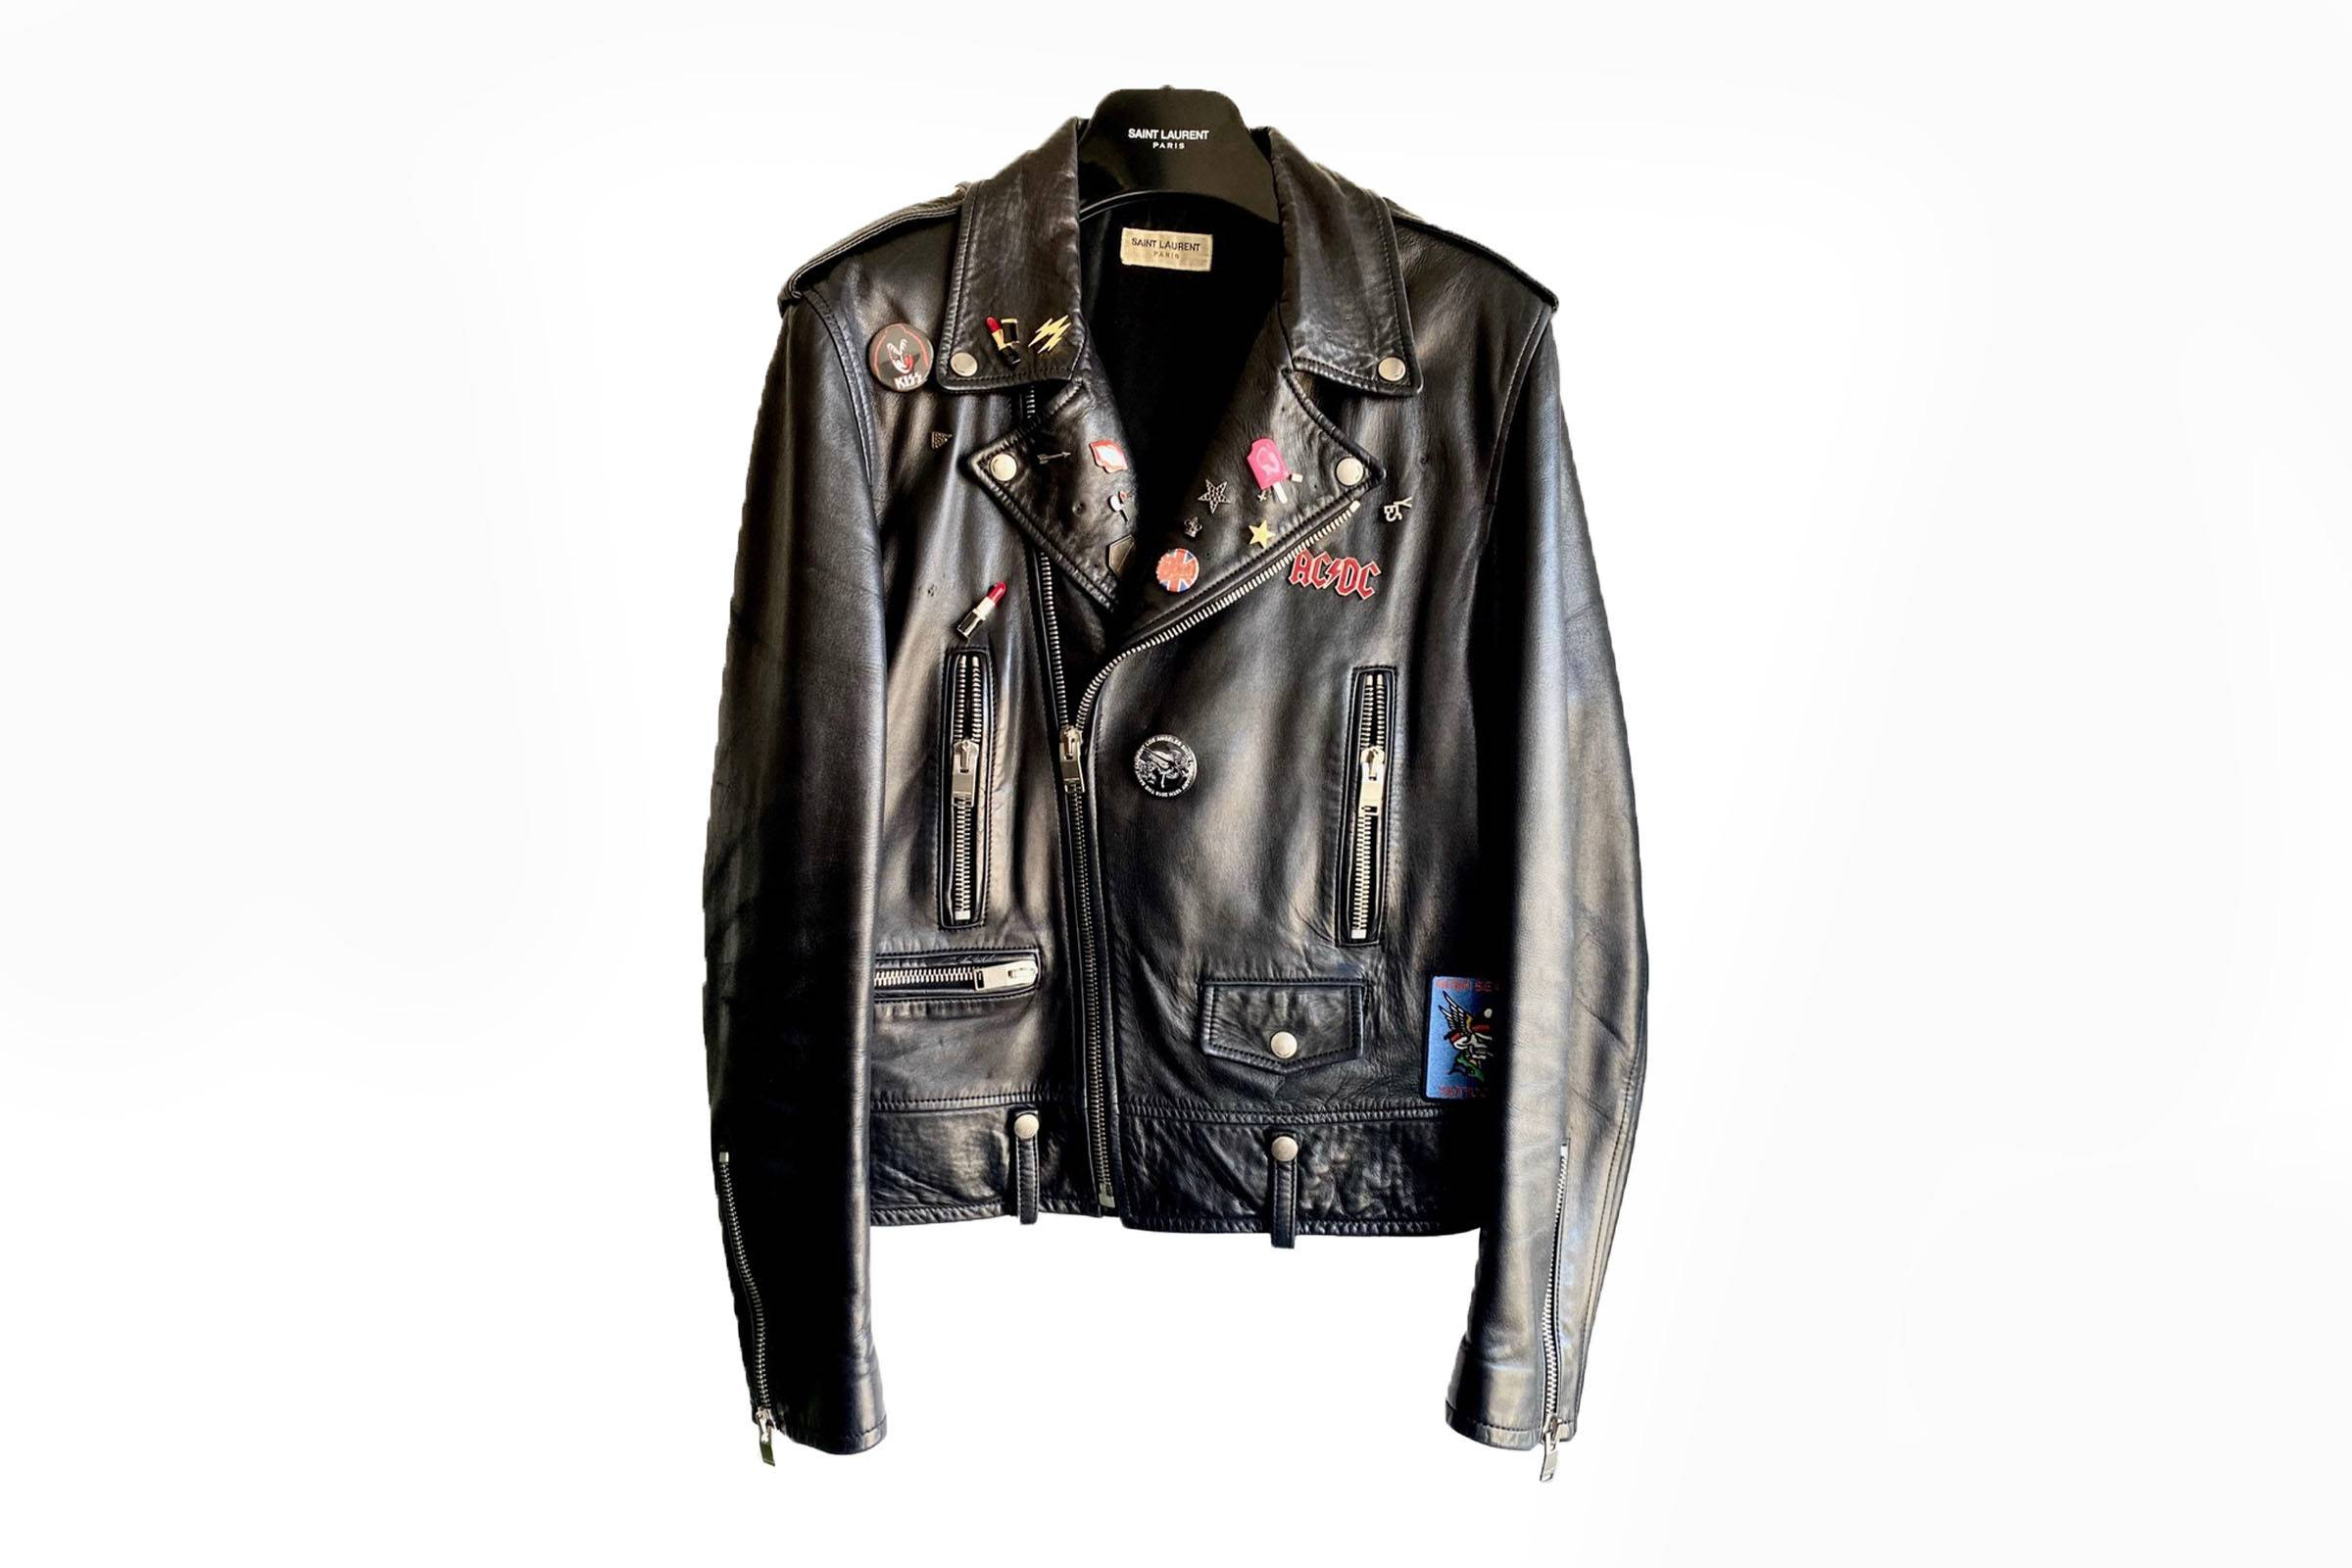 Saint Laurent Paris Fall/Winter 2013 L01 Pins Biker Jacket